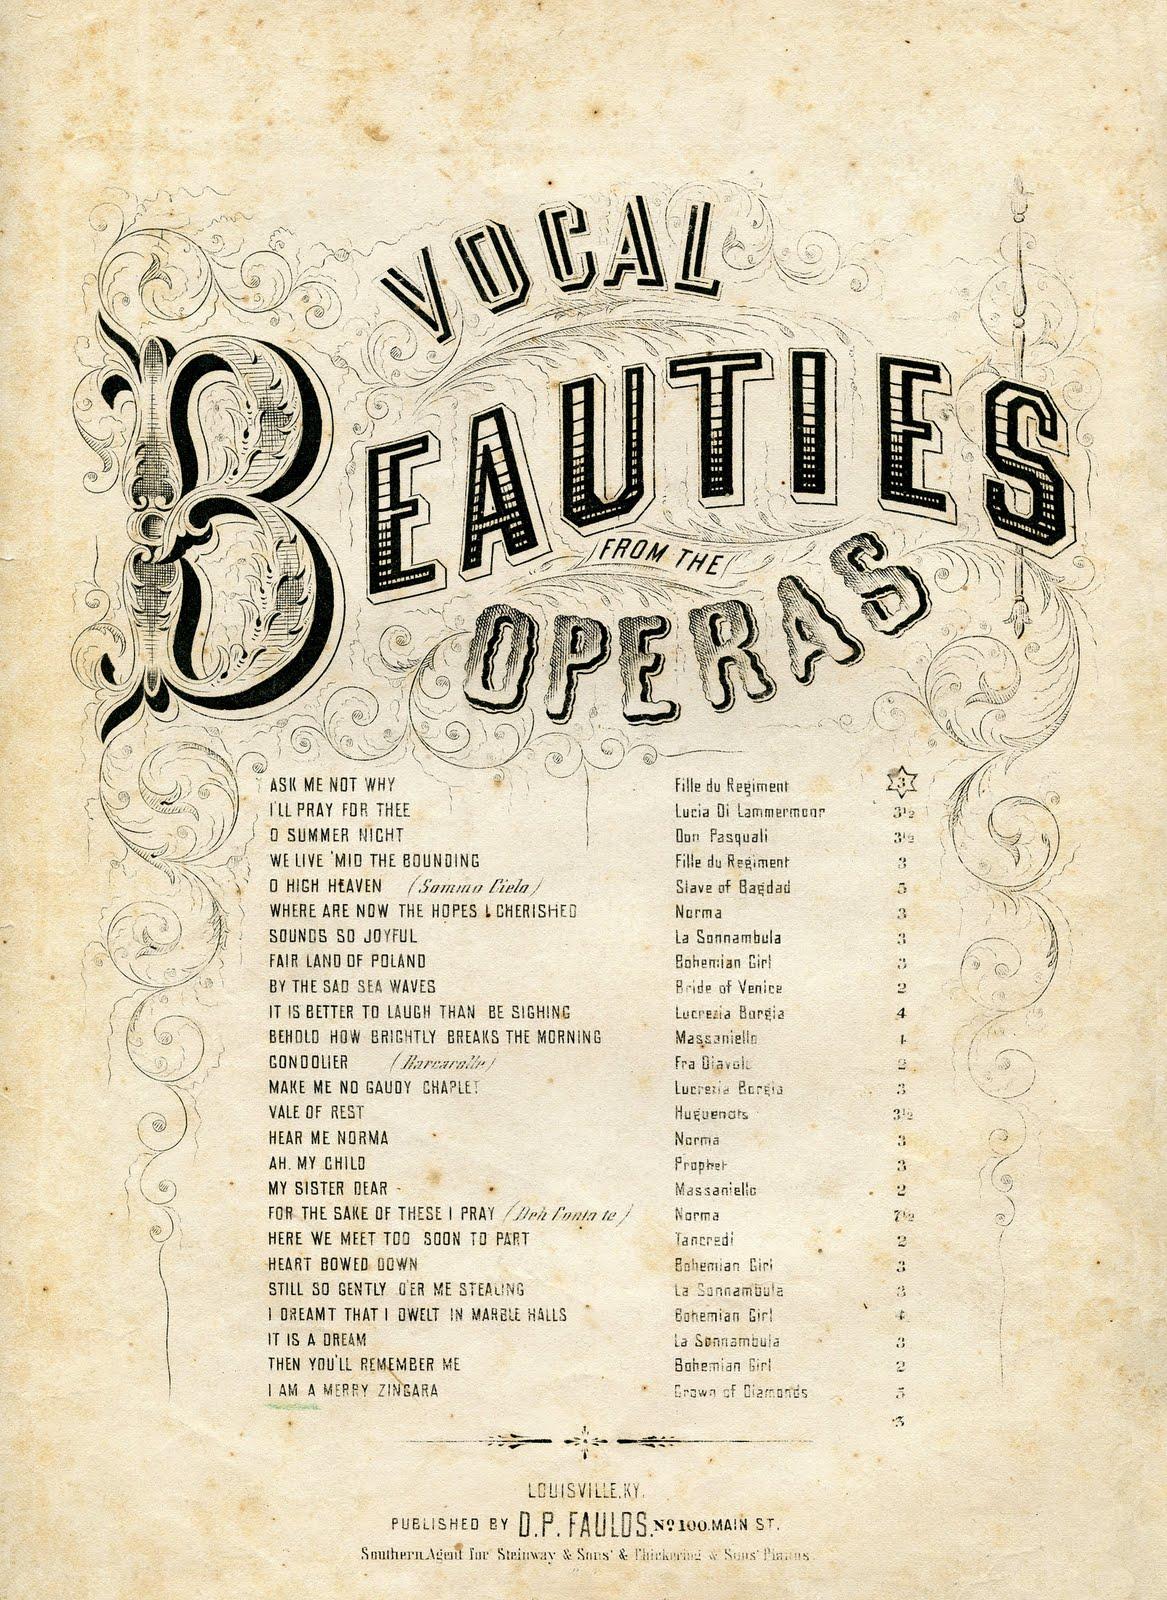 Sheet Music clipart opera Opera Ephemera – Vintage The